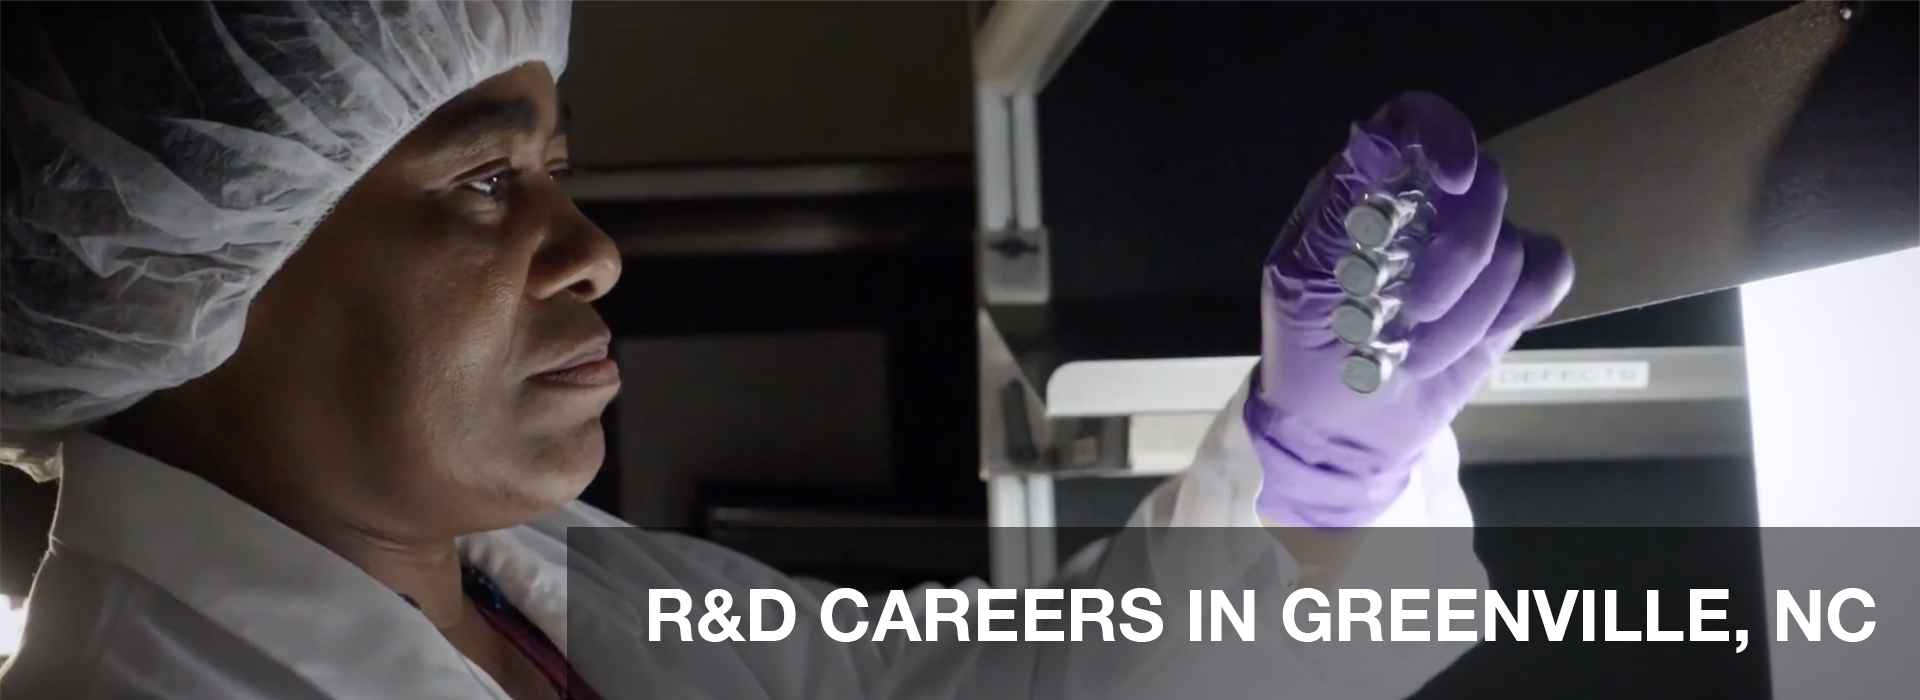 R&D CAREERS IN GREENVILLE,NC